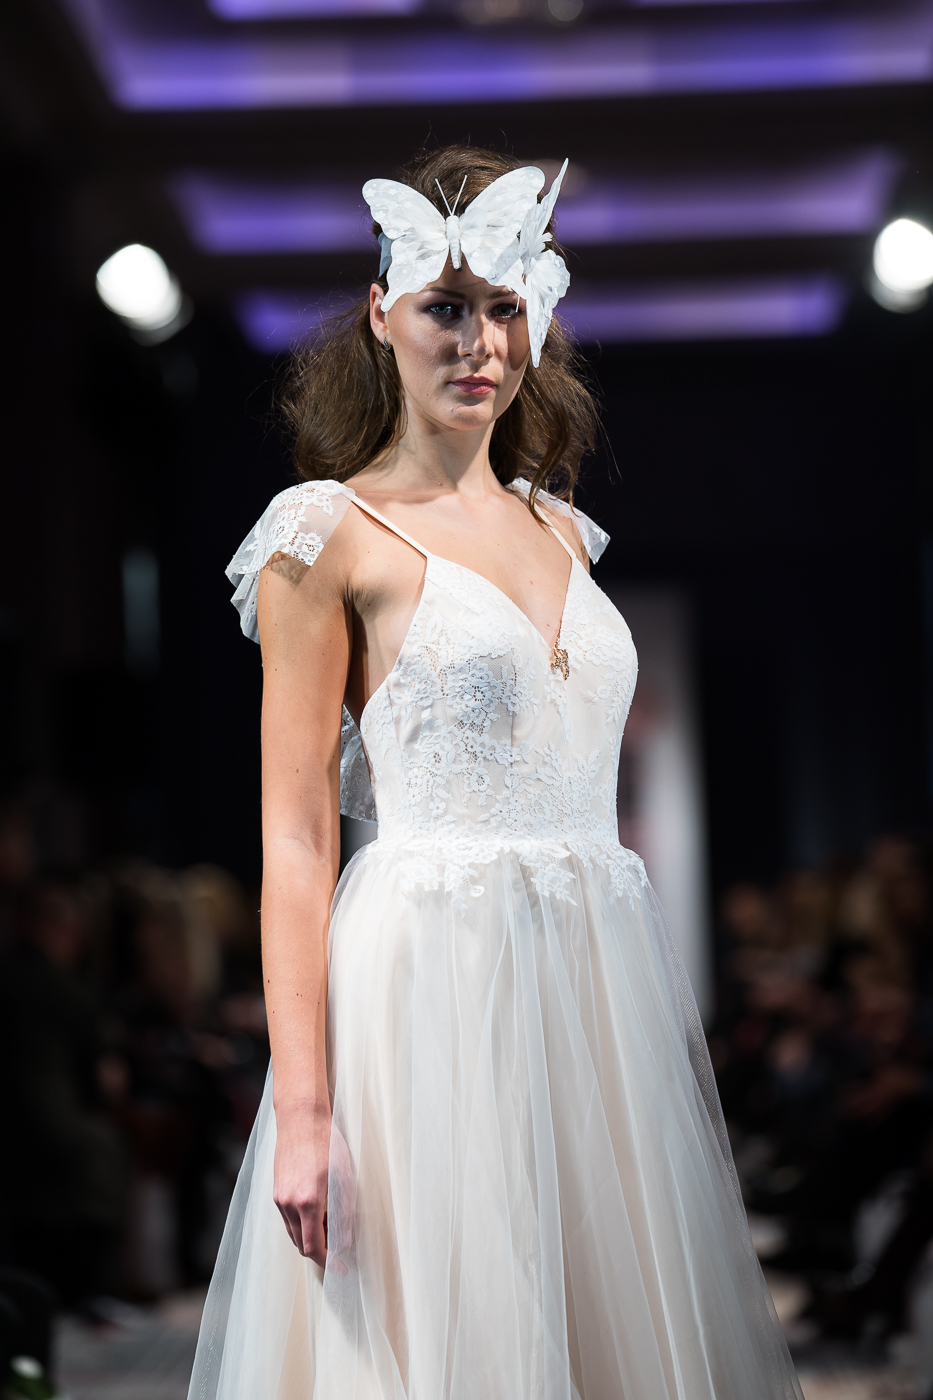 Amelia-wedding-dresses-140